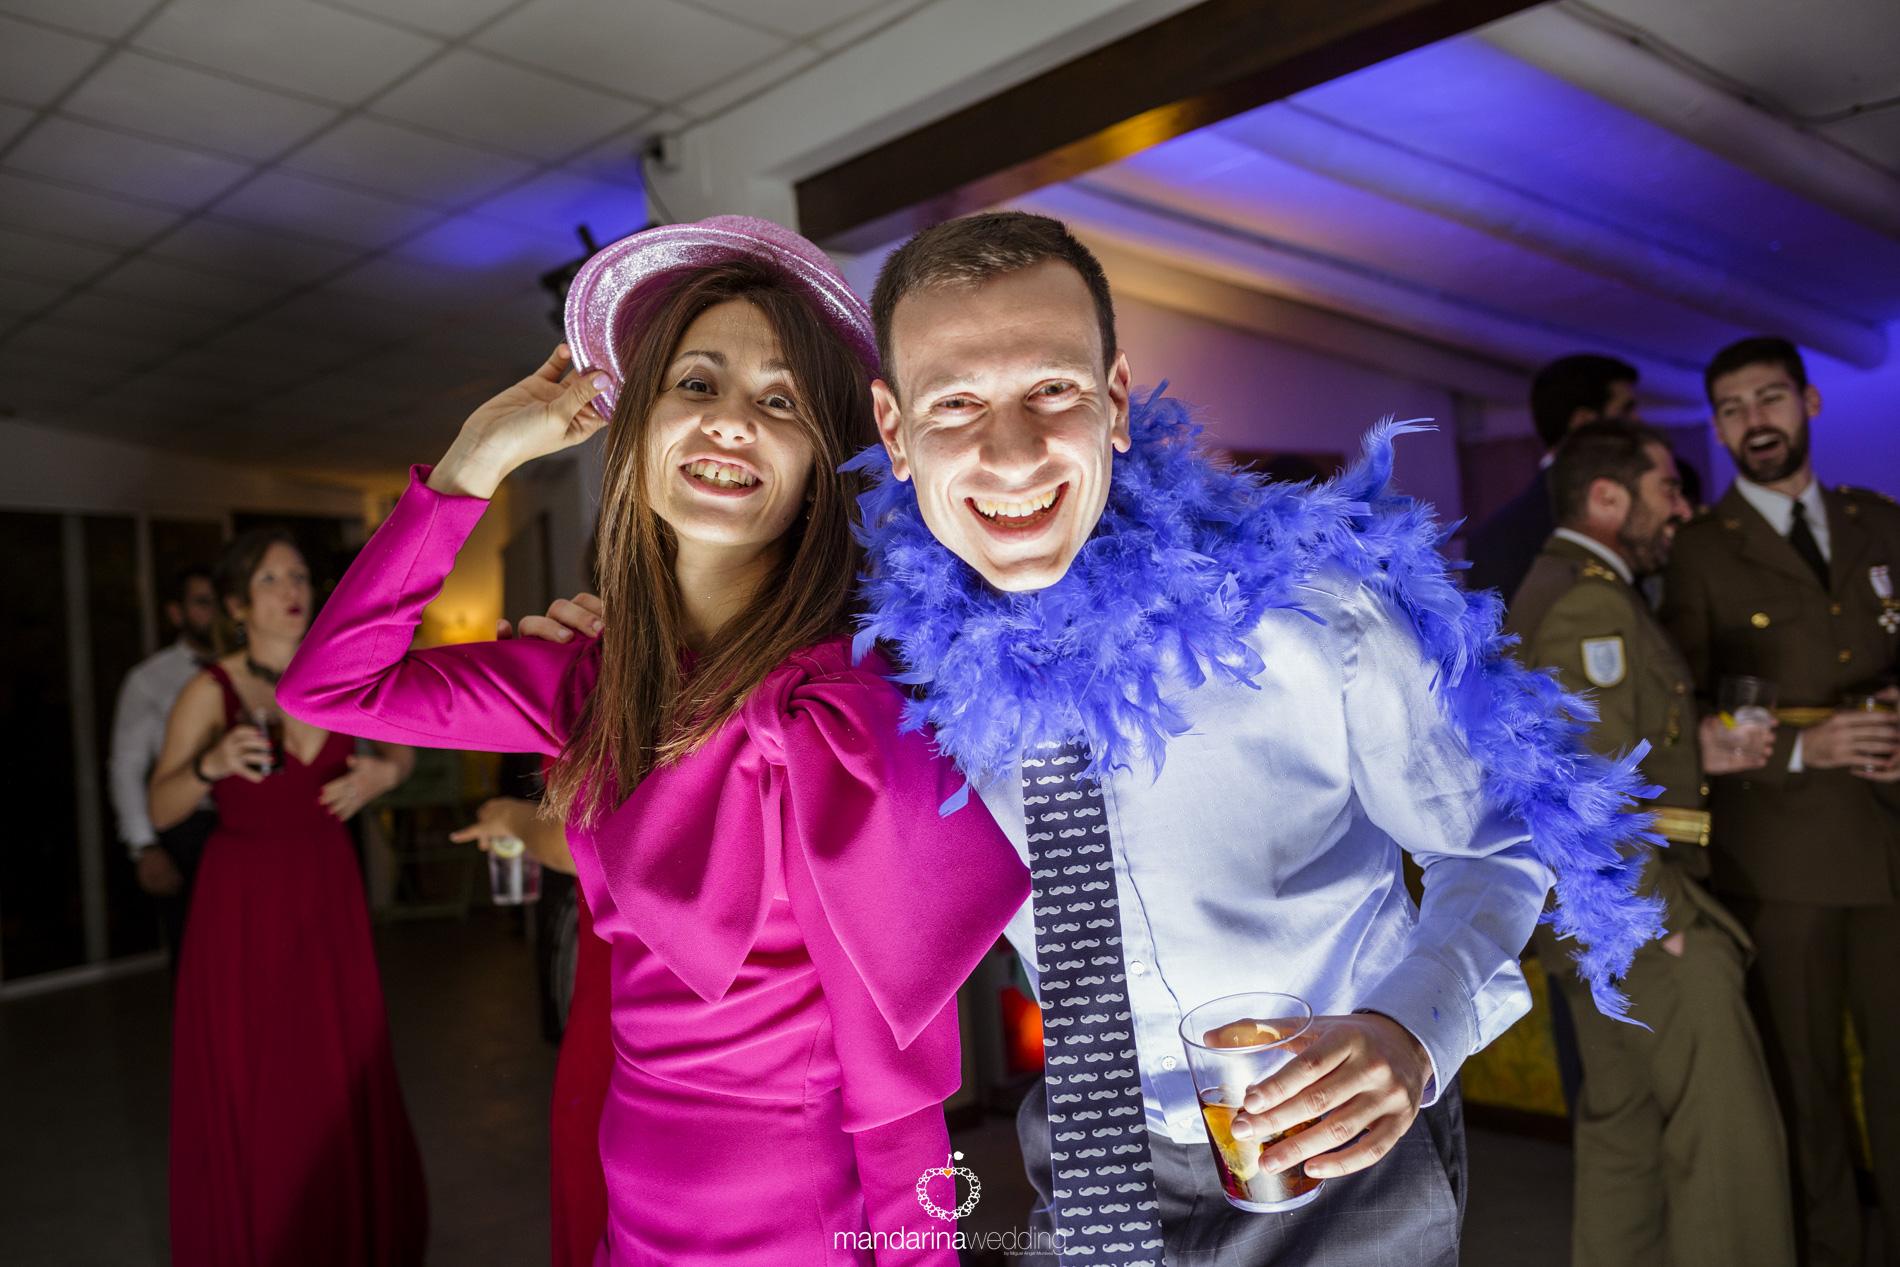 mandarina wedding, fotografos de boda, fotografo boda soria, fotografo boda barcelona, fotografo boda Madrid, fotógrafo boda lerida_14